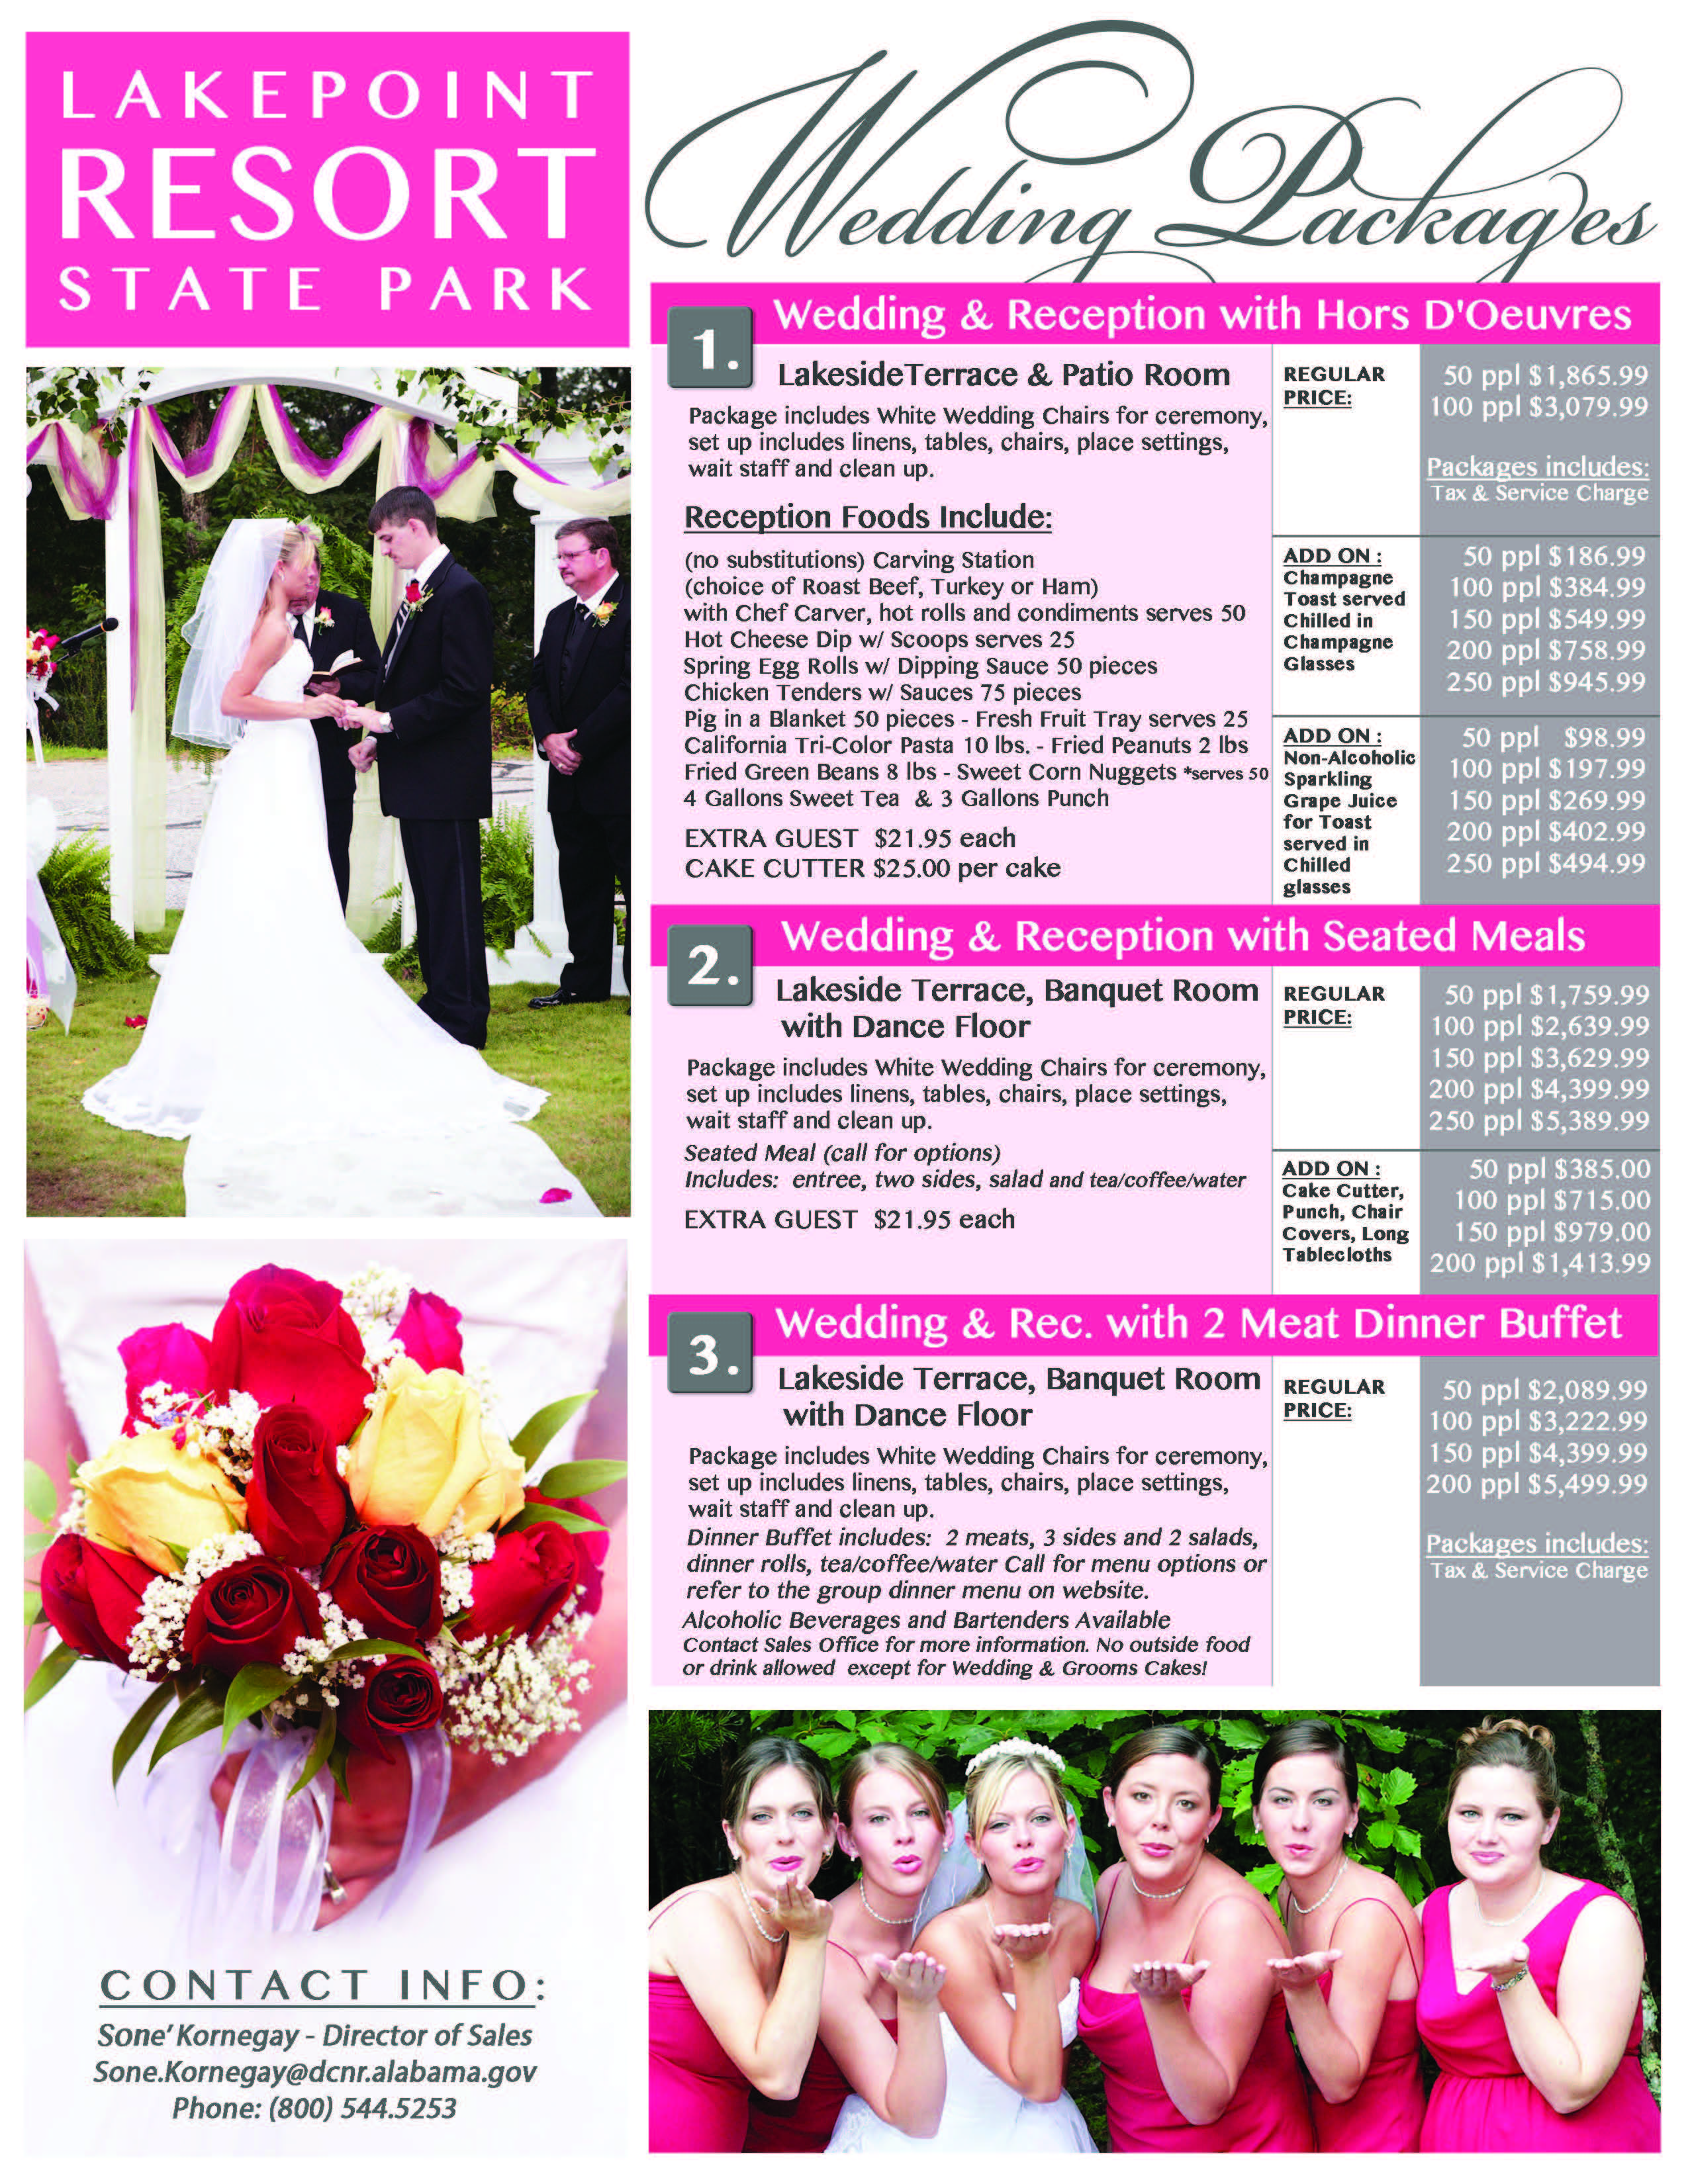 https://alabama-travel.s3.amazonaws.com/partners-uploads/photo/image/5772b5785d5bc9dbe6000160/wedding_packages.jpg